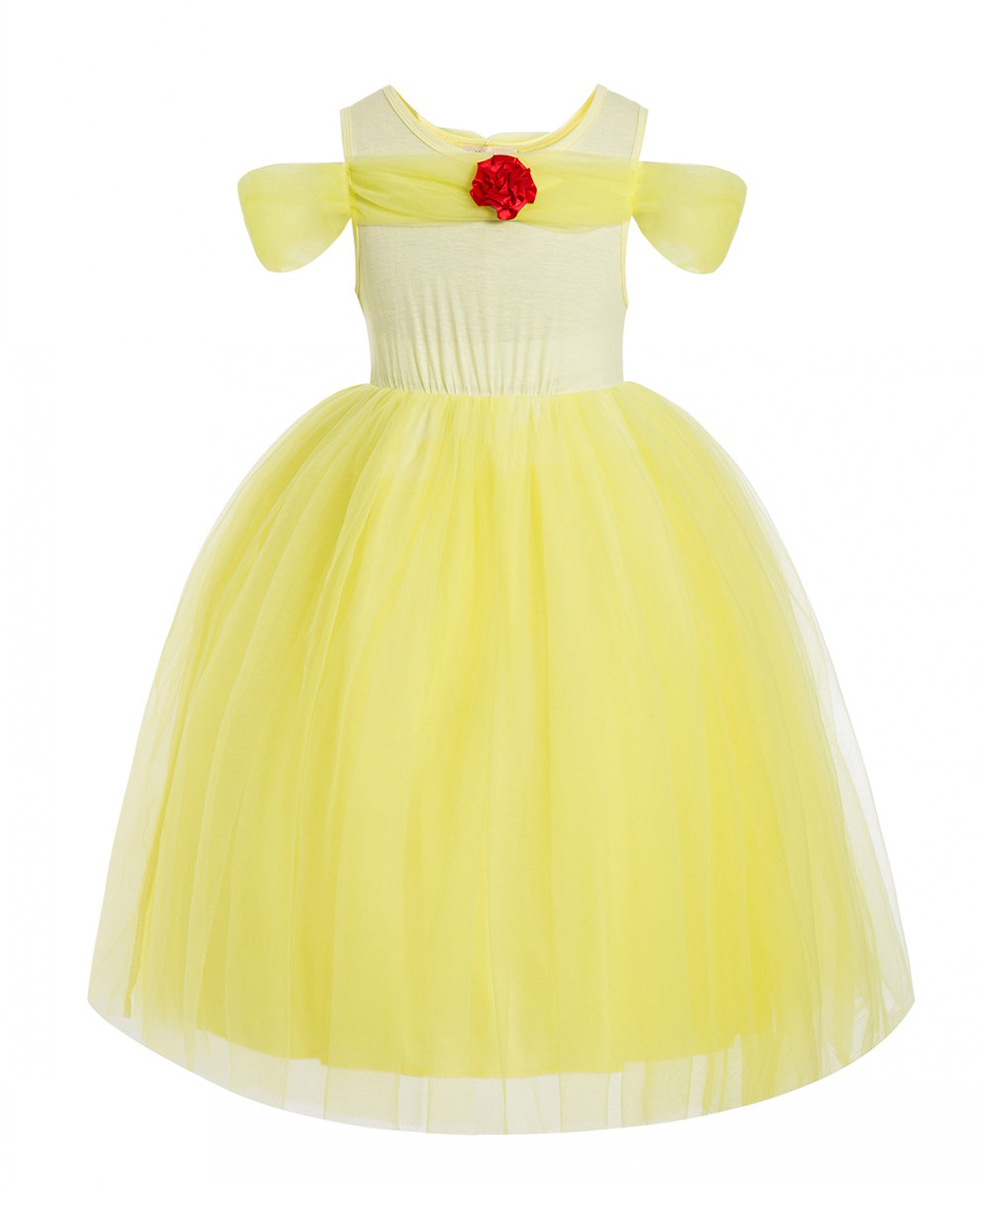 Belle tutu dress (2)